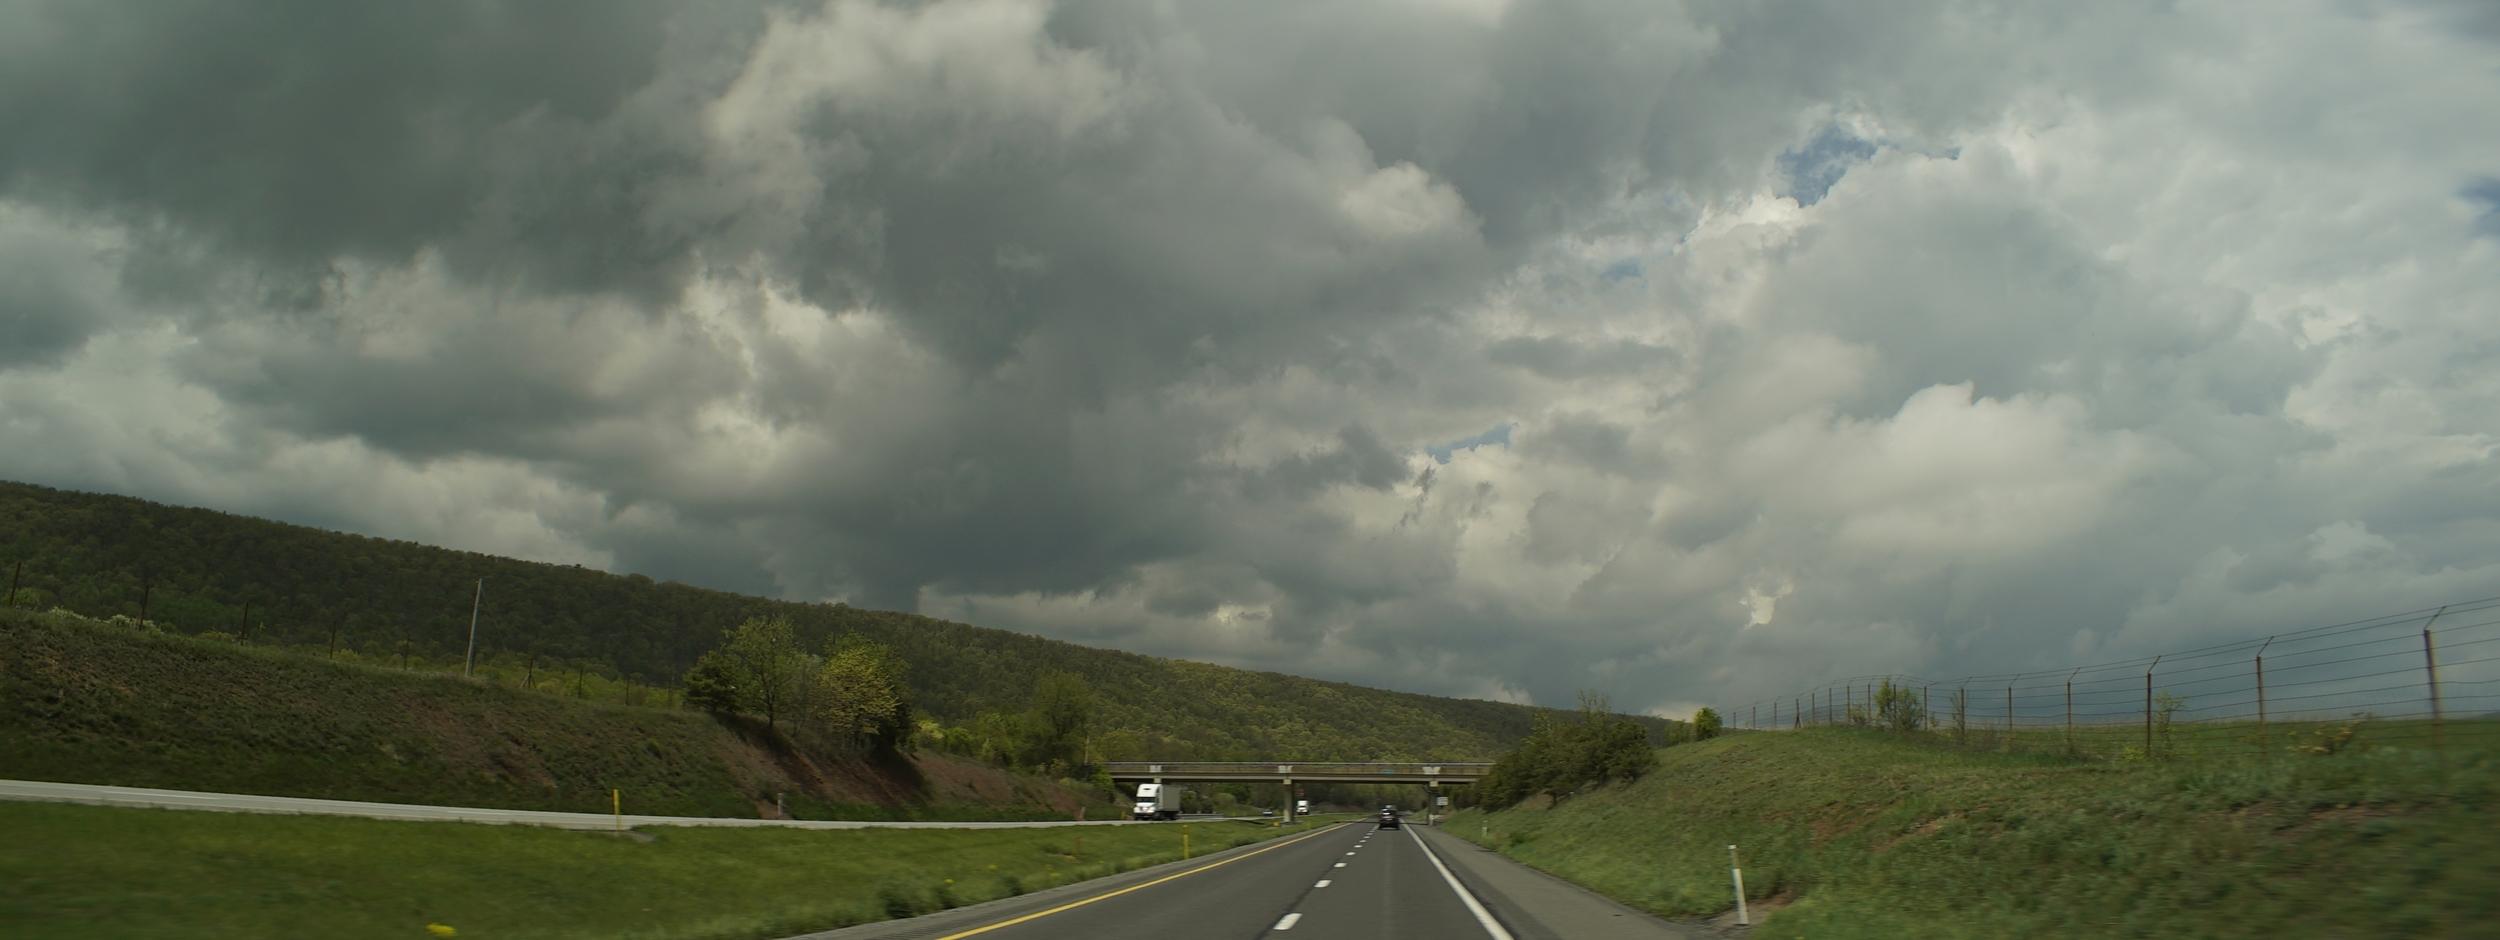 Elite 24.5mm anamorphic | Pennsylvania Highway - T4.0. Photo by Keith Nickoson.